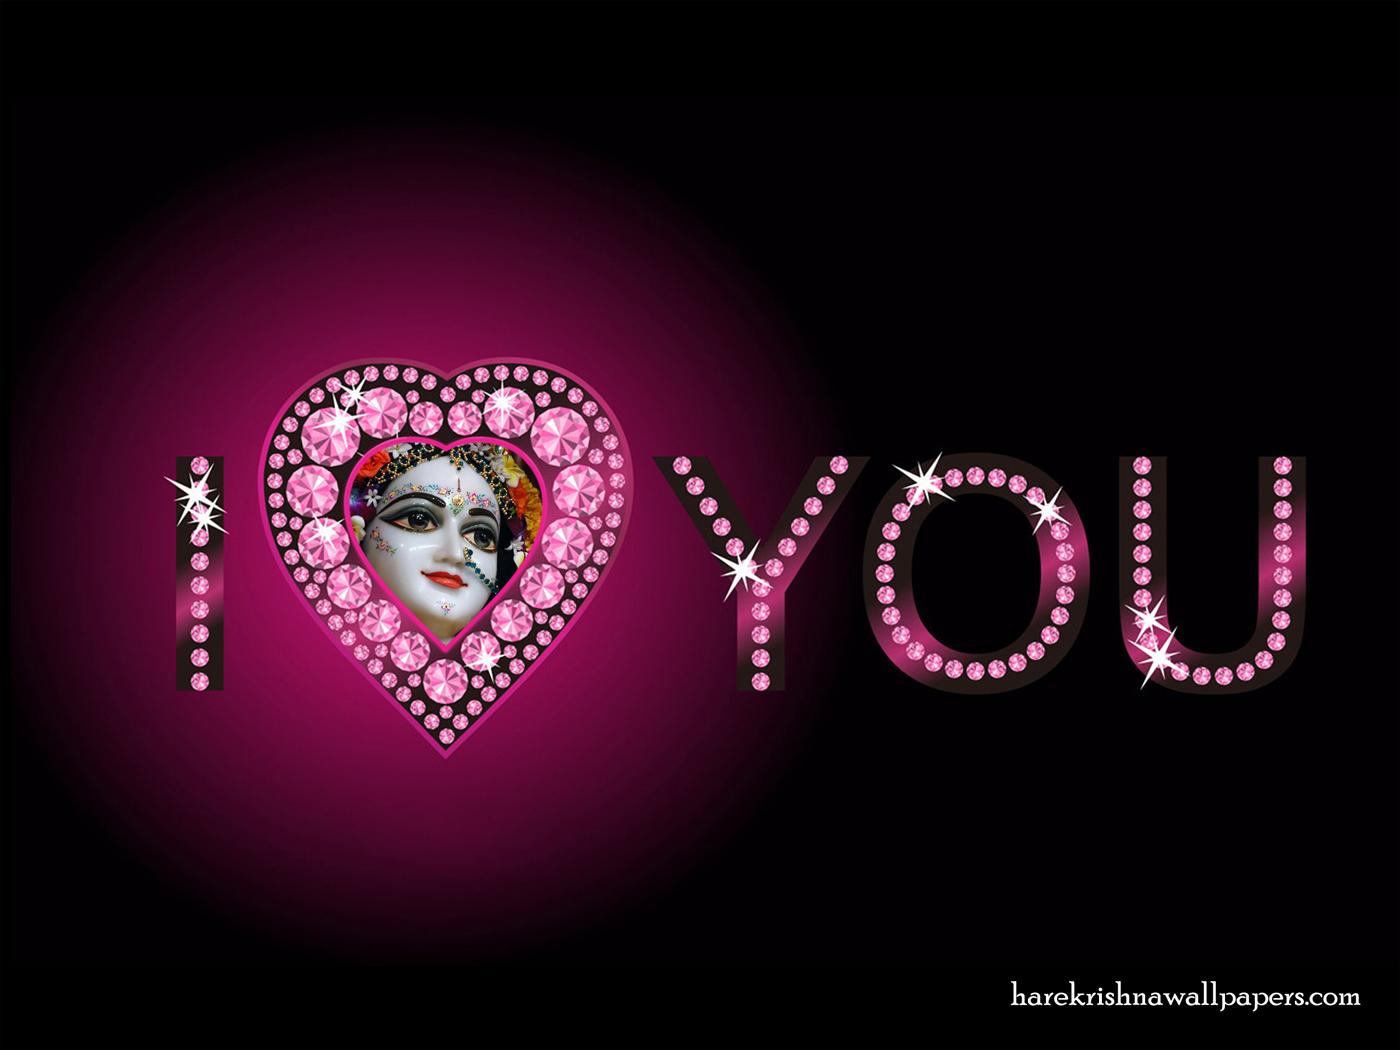 I Love You Radharani Wallpaper (013) Size 1400x1050 Download